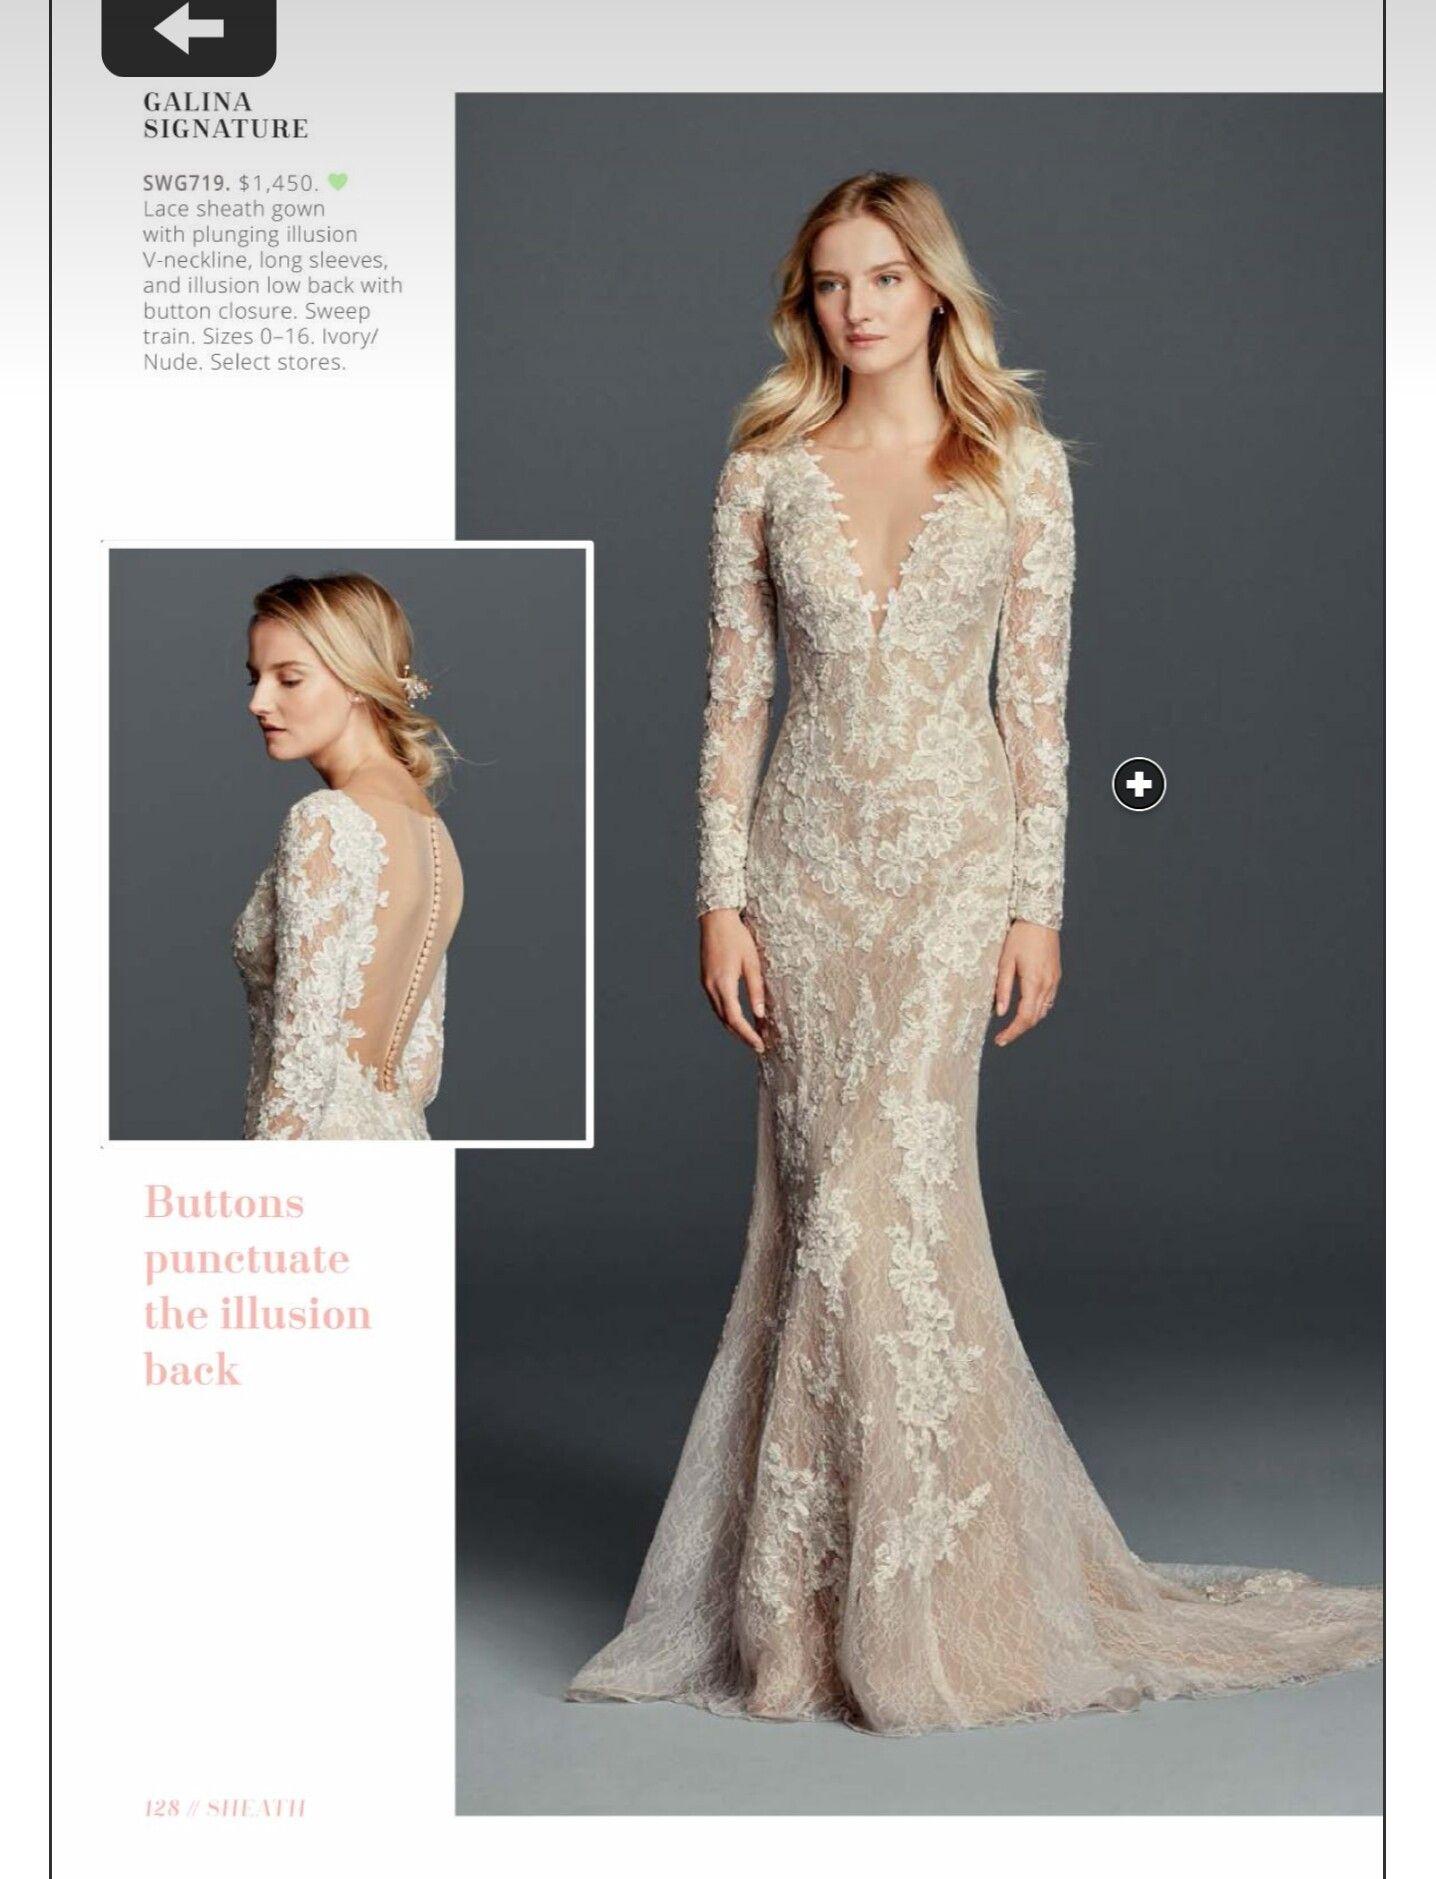 Slim fit wedding dresses  Pin by Amelia Schwartz on Mawwiage  Pinterest